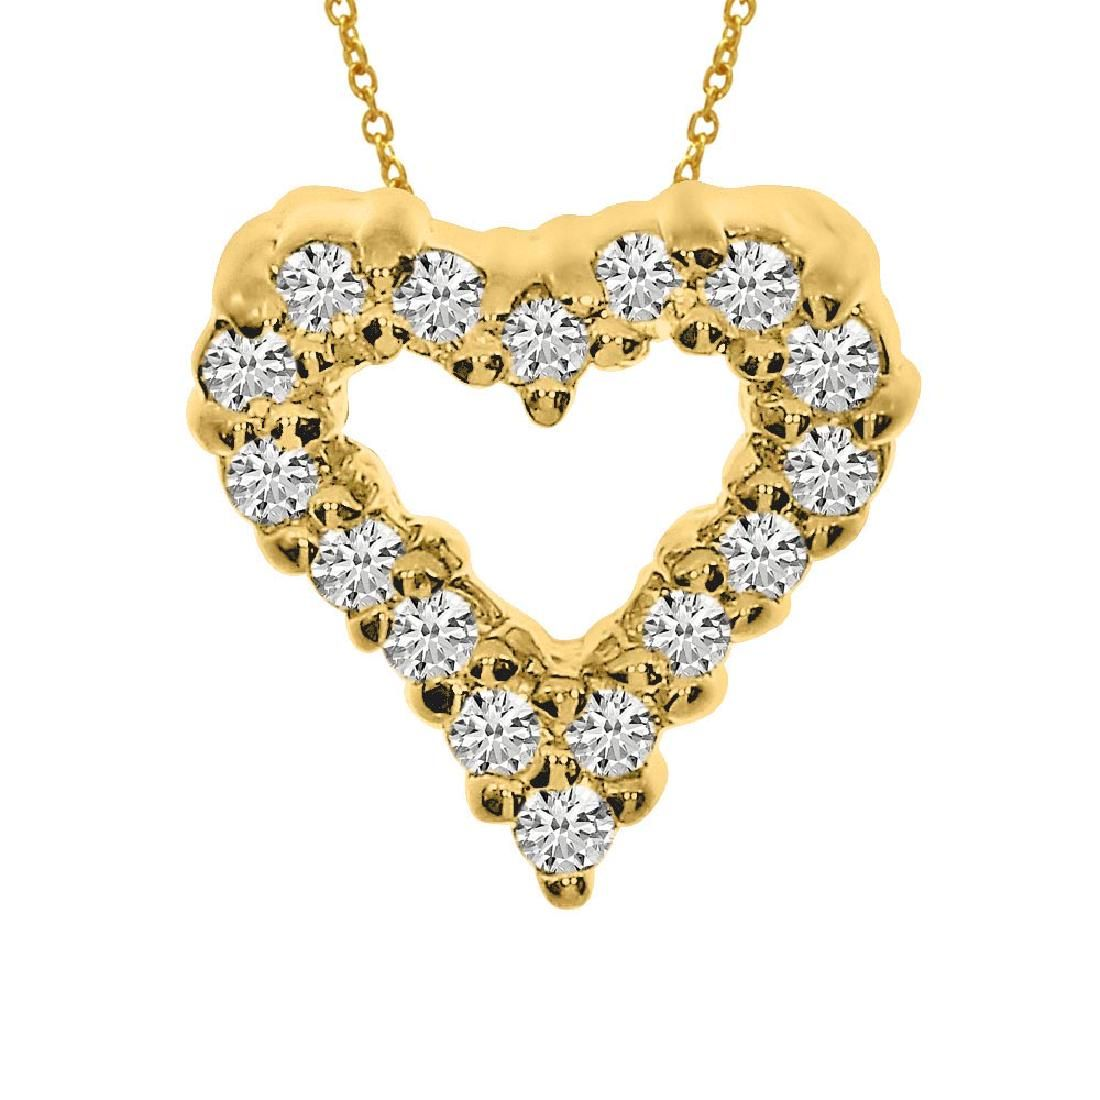 Certified 14K Yellow Gold Diamond Heart Pendant 0.25 CT